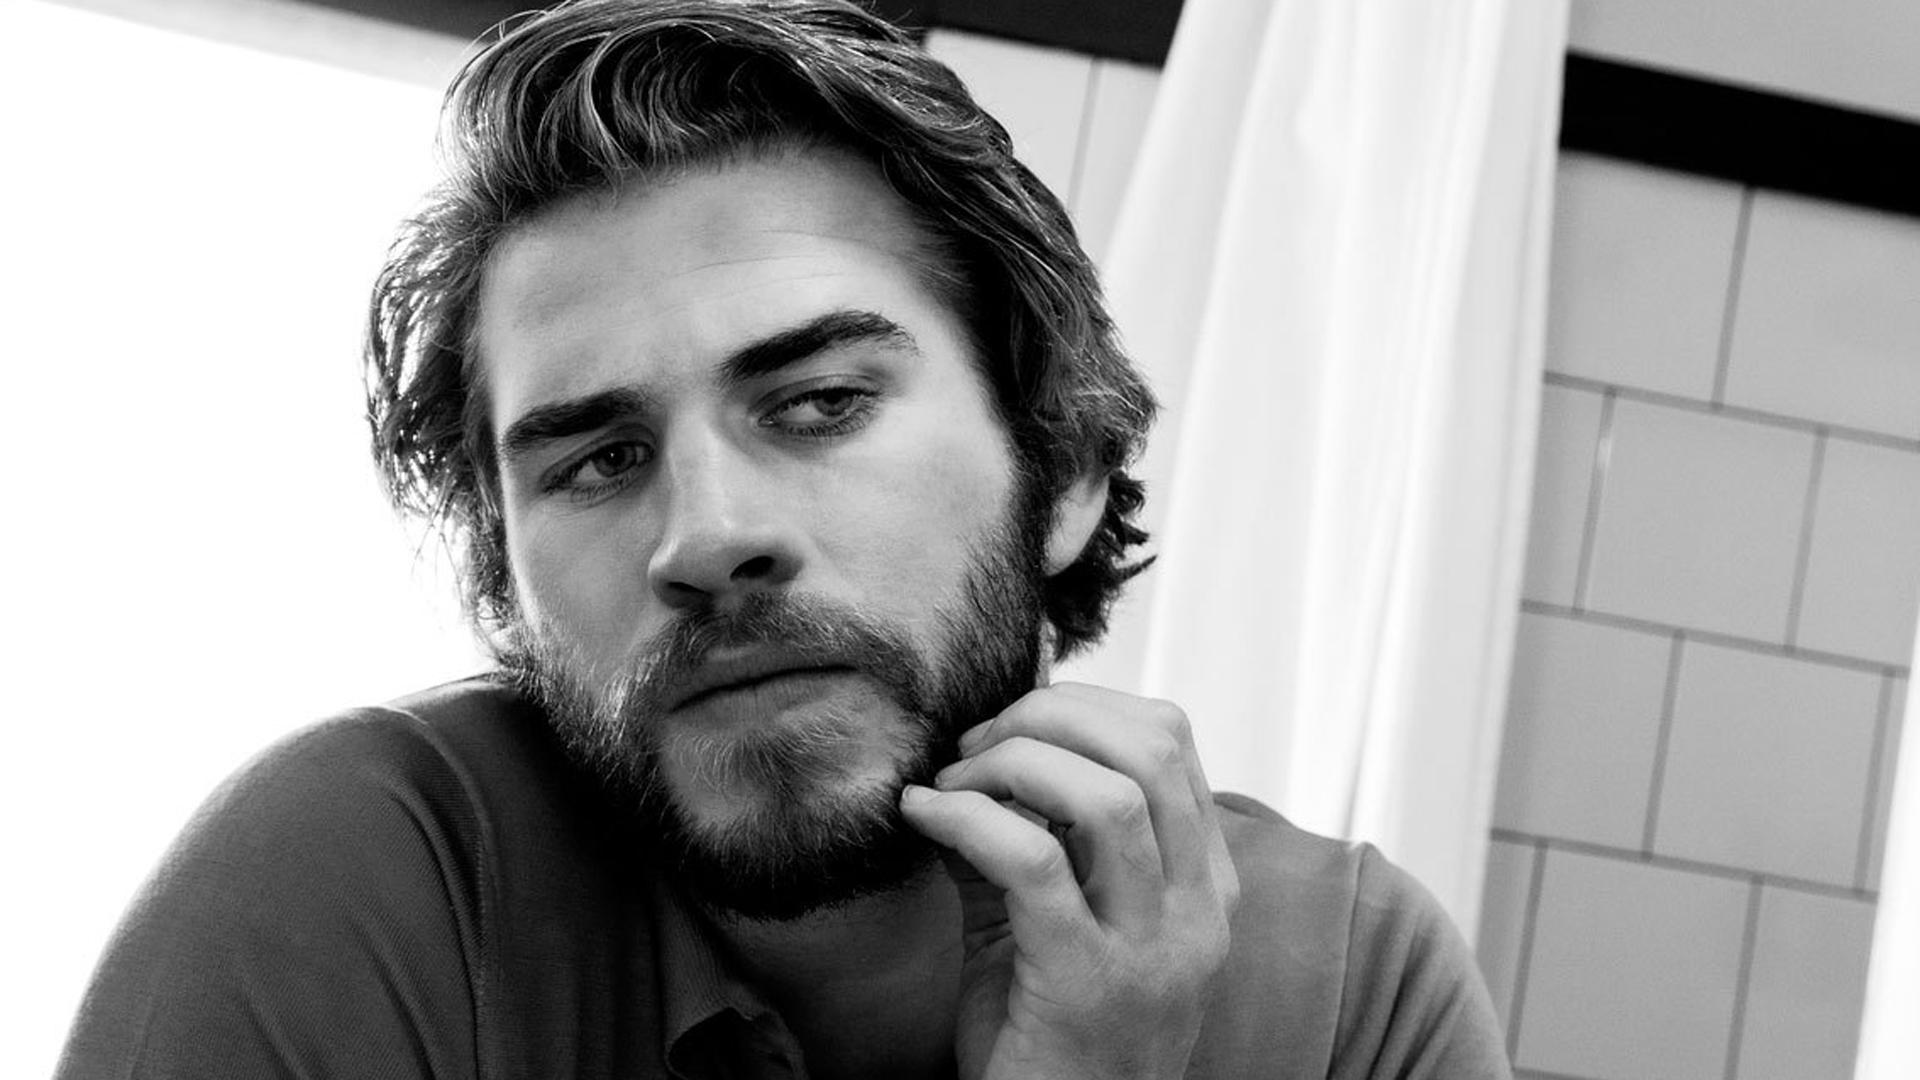 Liam Hemsworth Hd Background